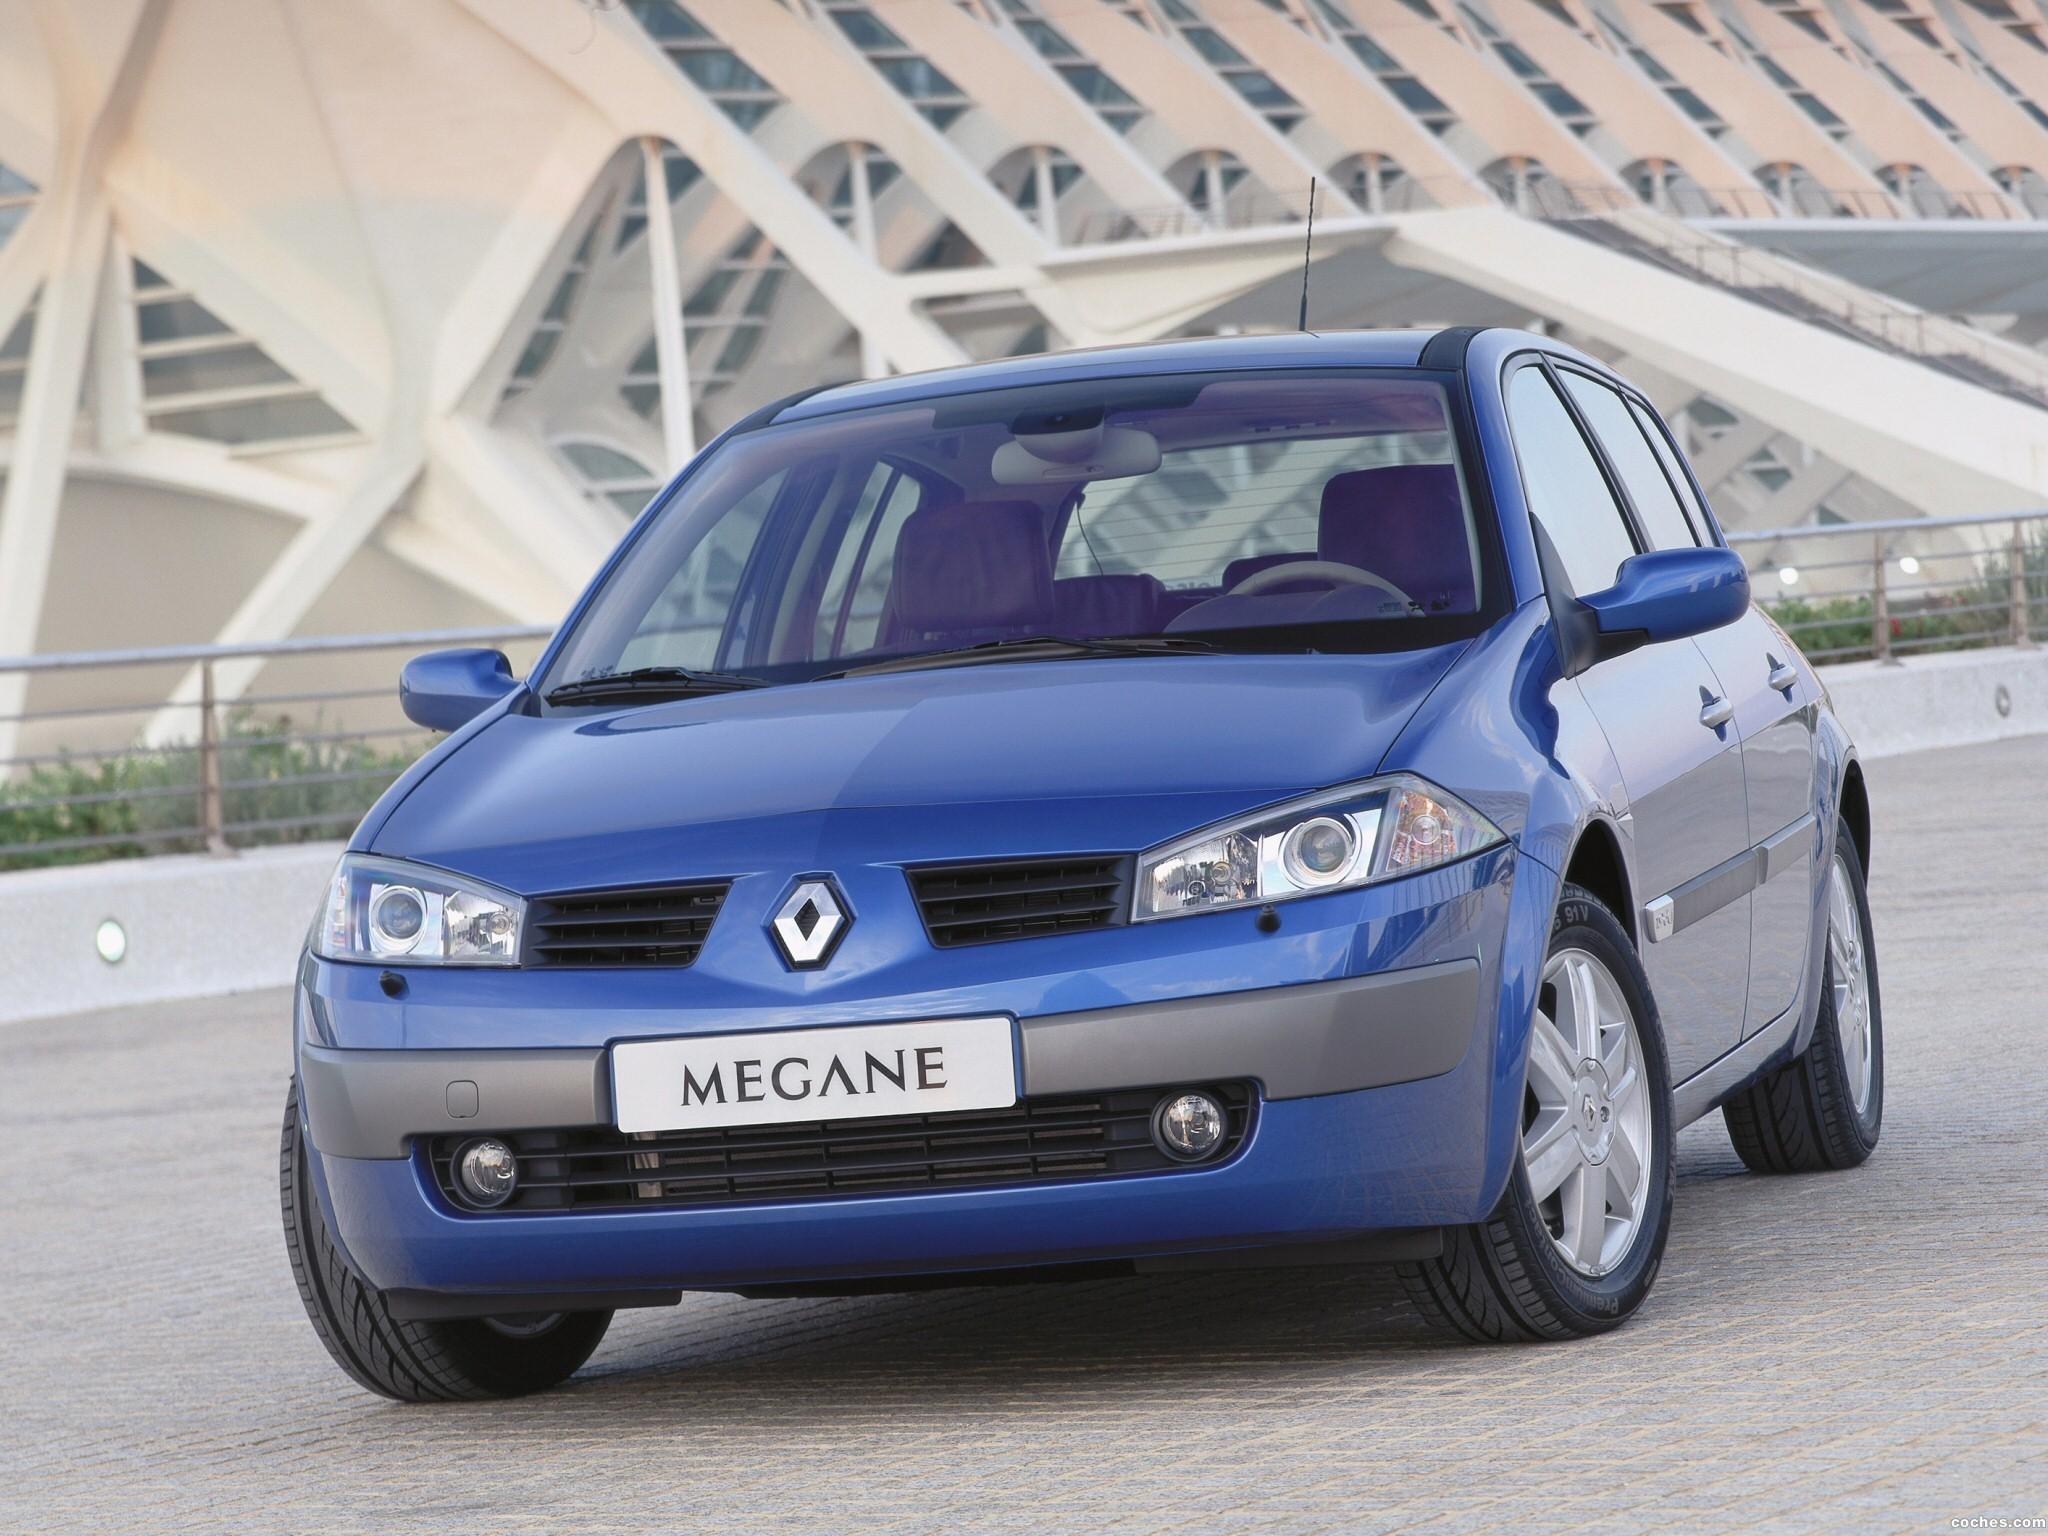 Foto 0 de Renault Megane 5 puertas 2002